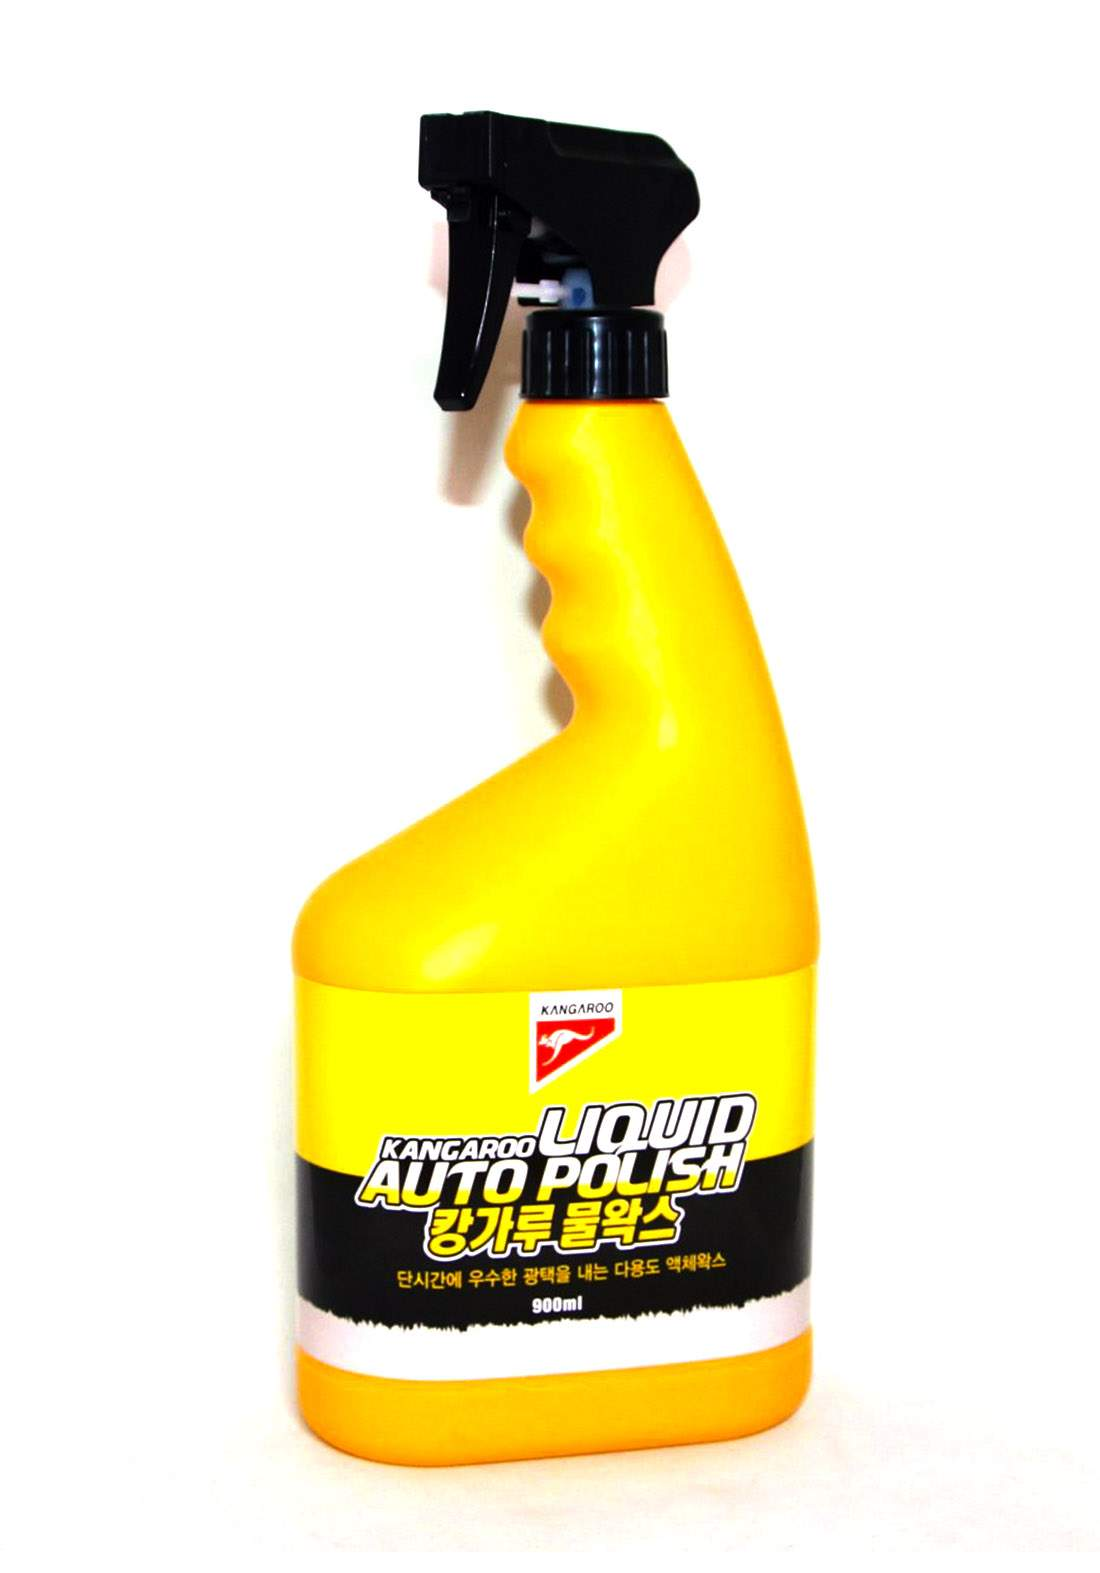 kangaroo liquid Auto Polish 900 ml غسول وشمع للسيارة